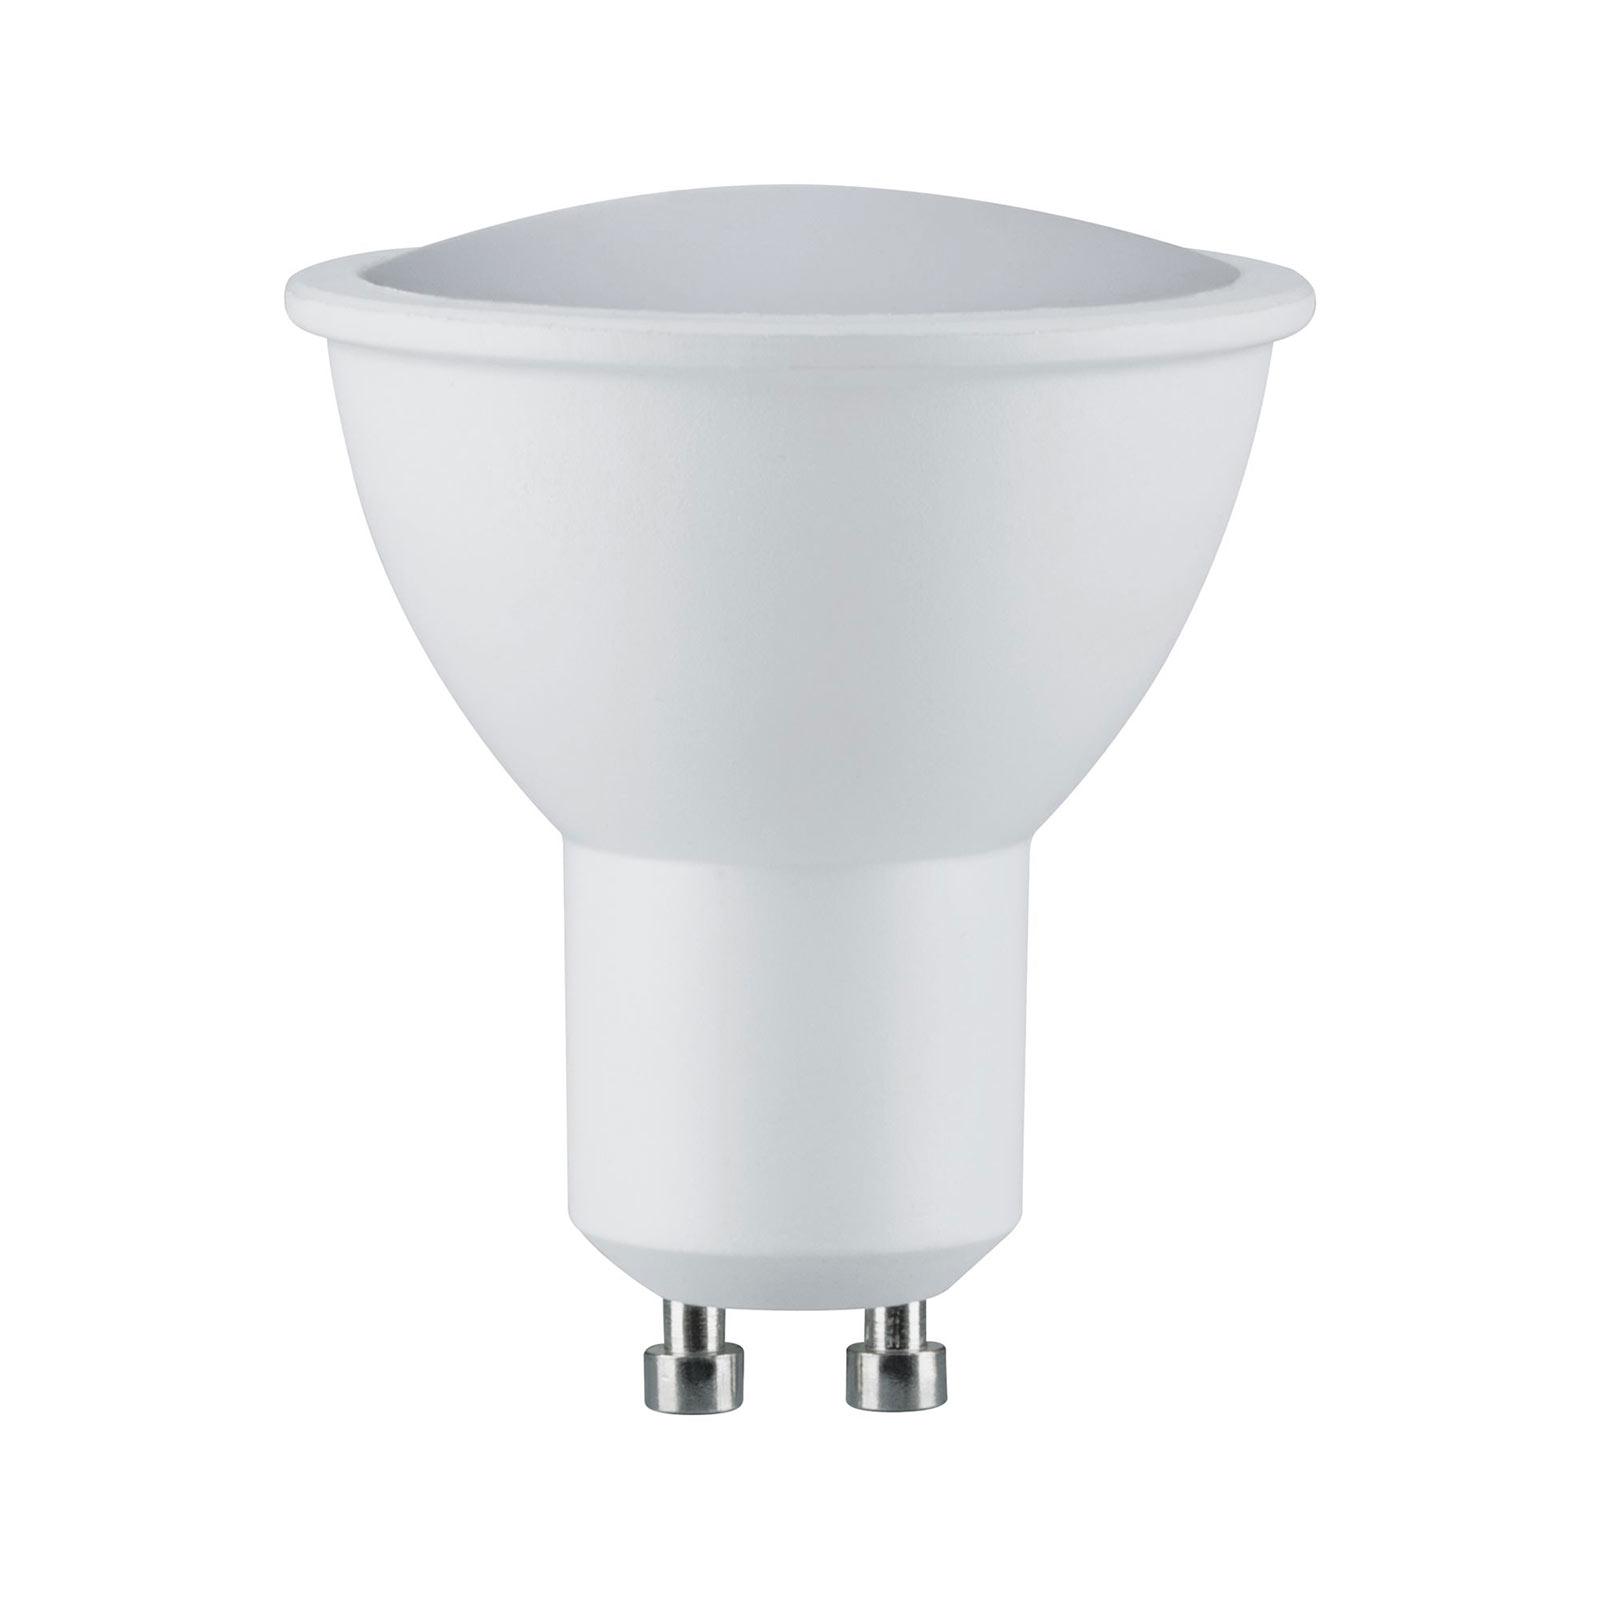 Paulmann LED-reflektor GU10 5,9W, CCT WhiteSwitch